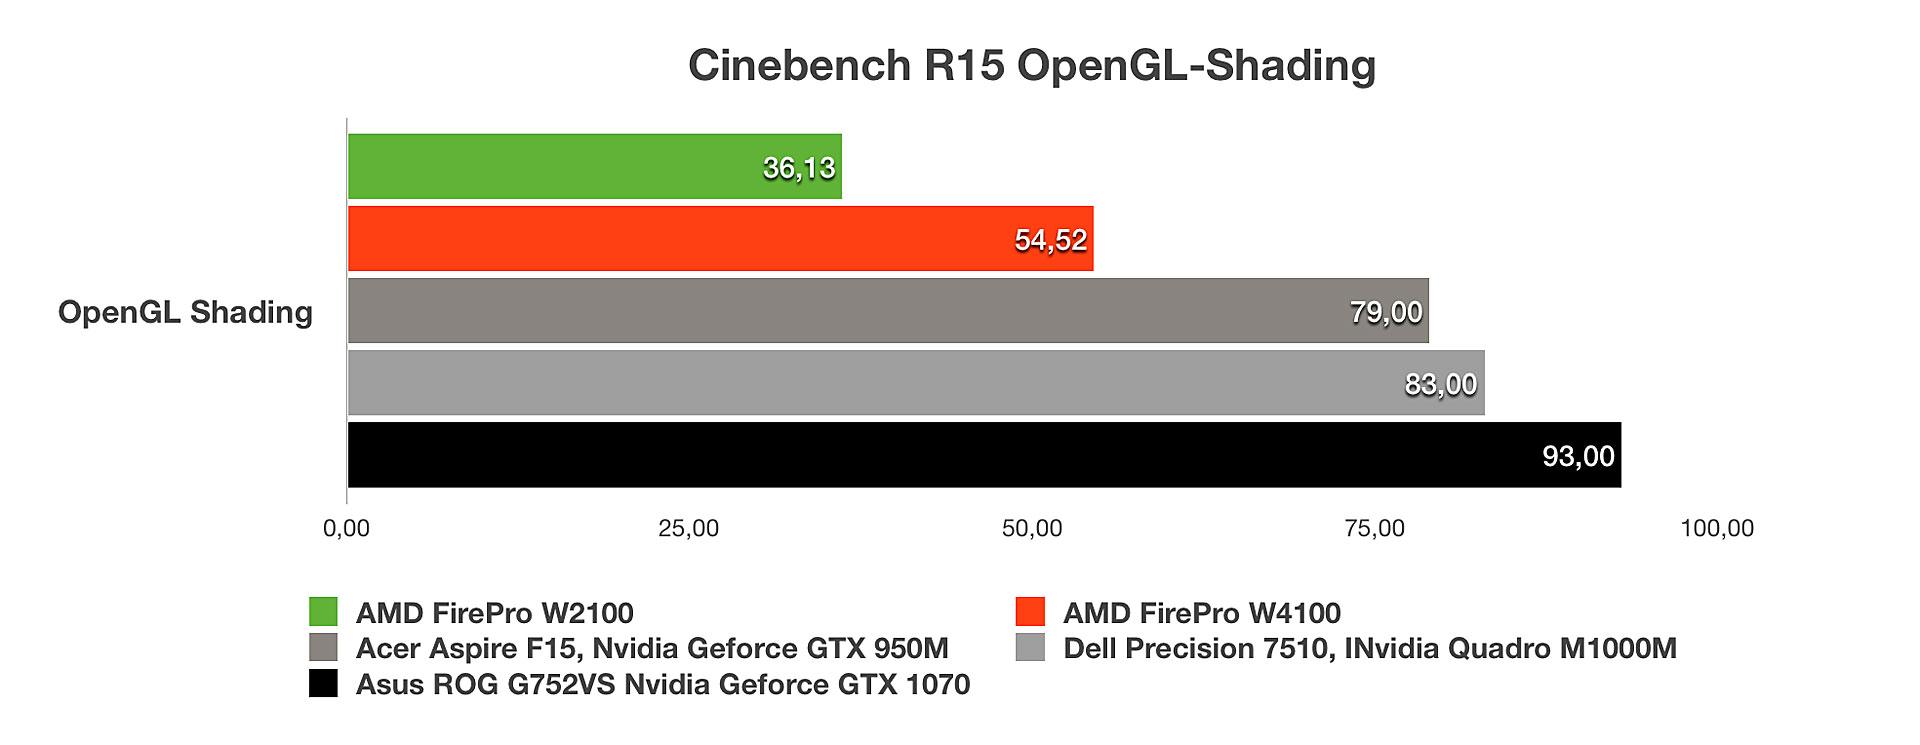 AMD FirePro W4100: Cinebench R15 OpenGL